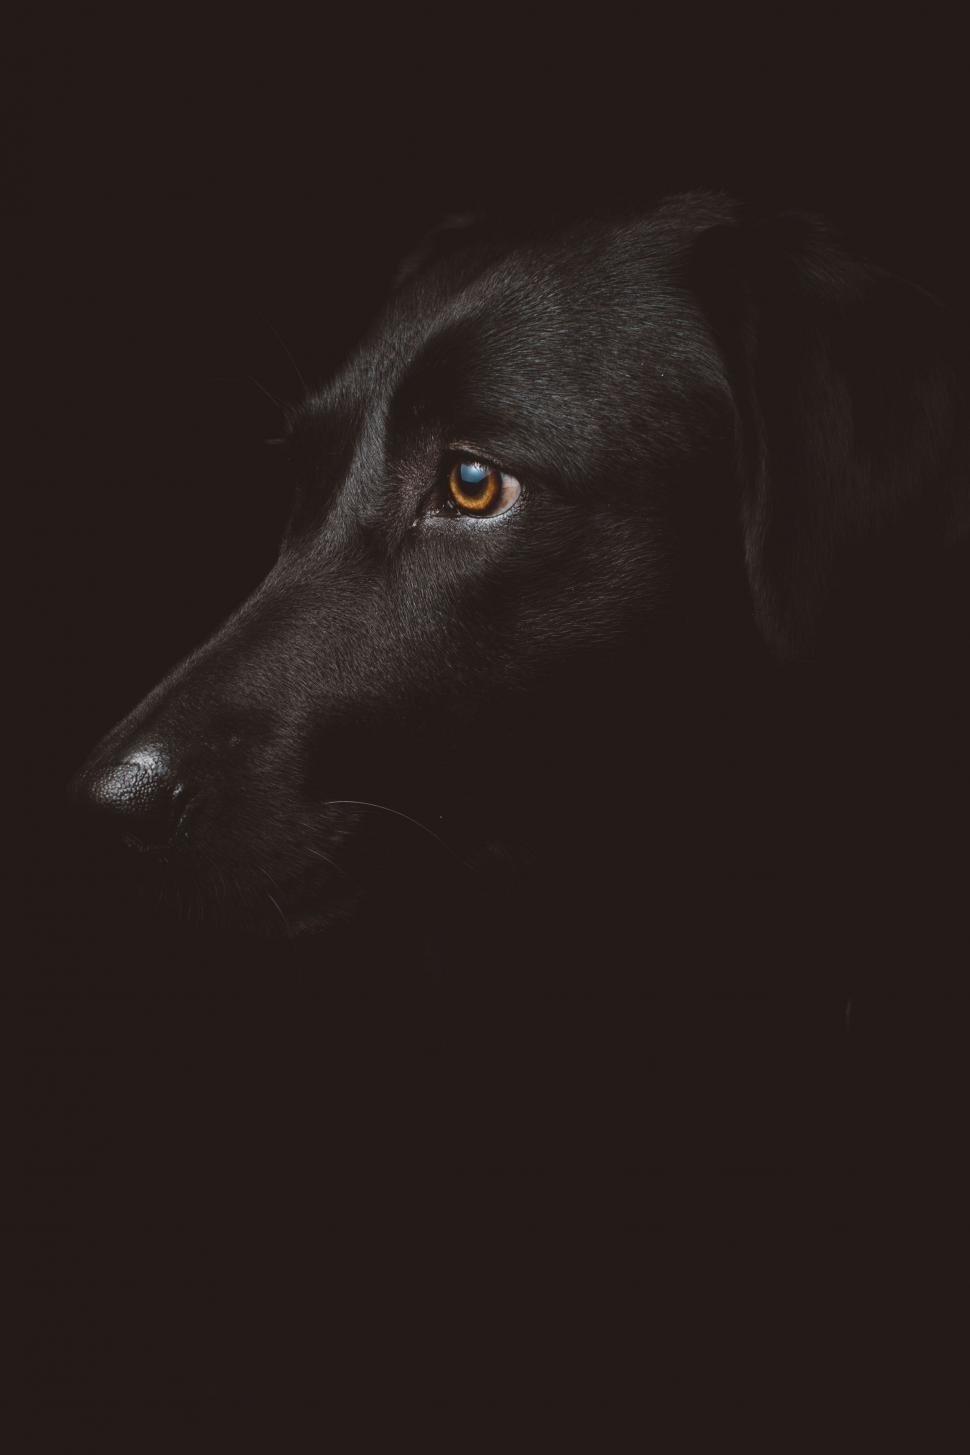 Download Free Stock Photo of retriever flat-coated retriever dog sporting dog groenendael hunting dog belgian sheepdog animal pet shepherd dog mammal cute canine